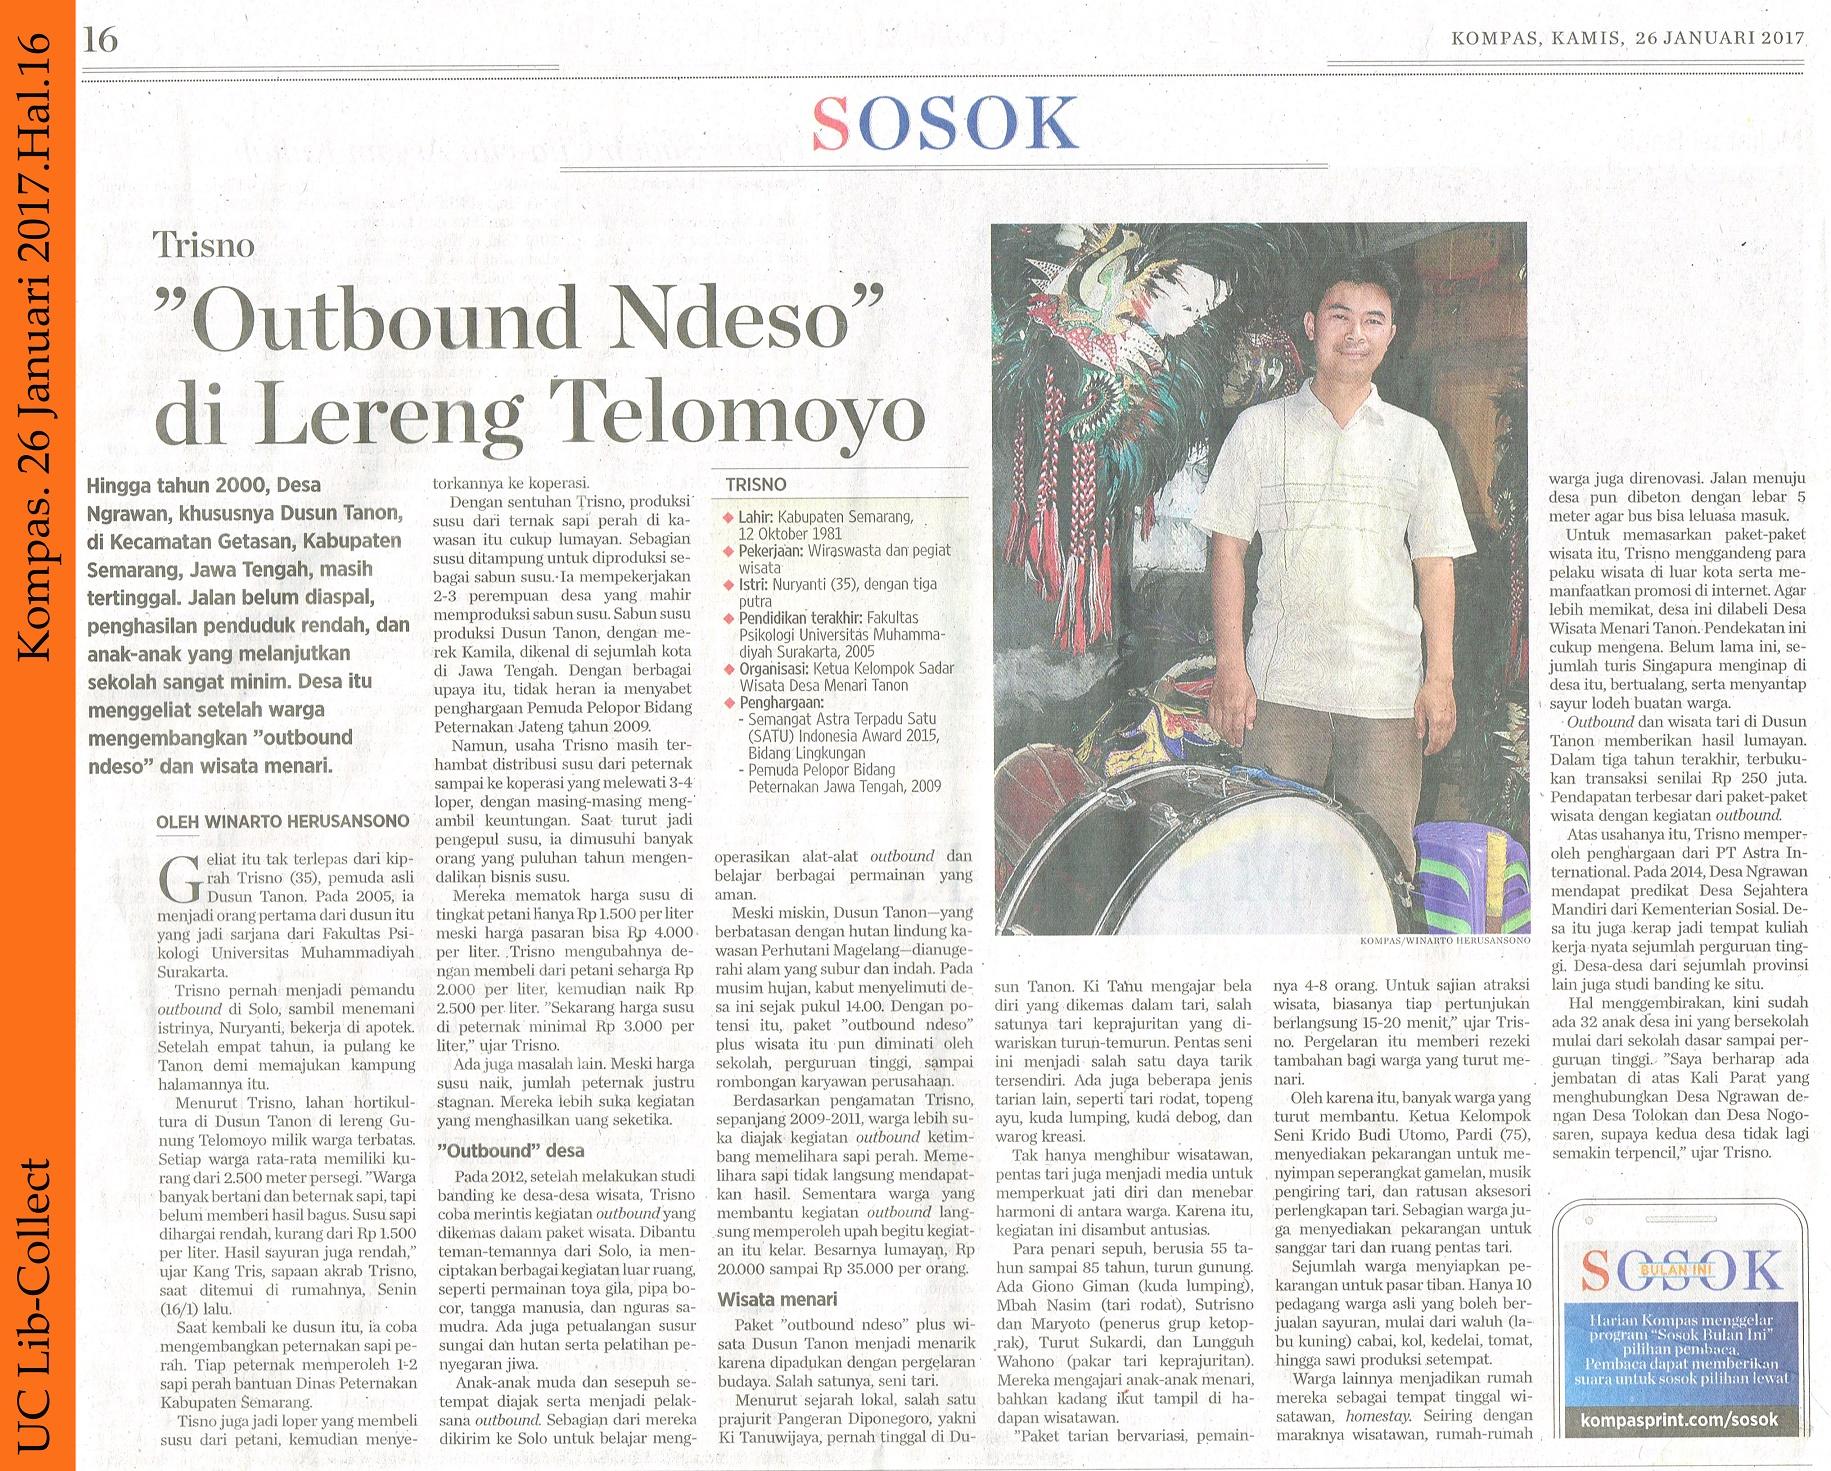 Trisno Outbound Ndeso di Lereng Telomoyo Kompas 26 Januari 2017 Hal 16